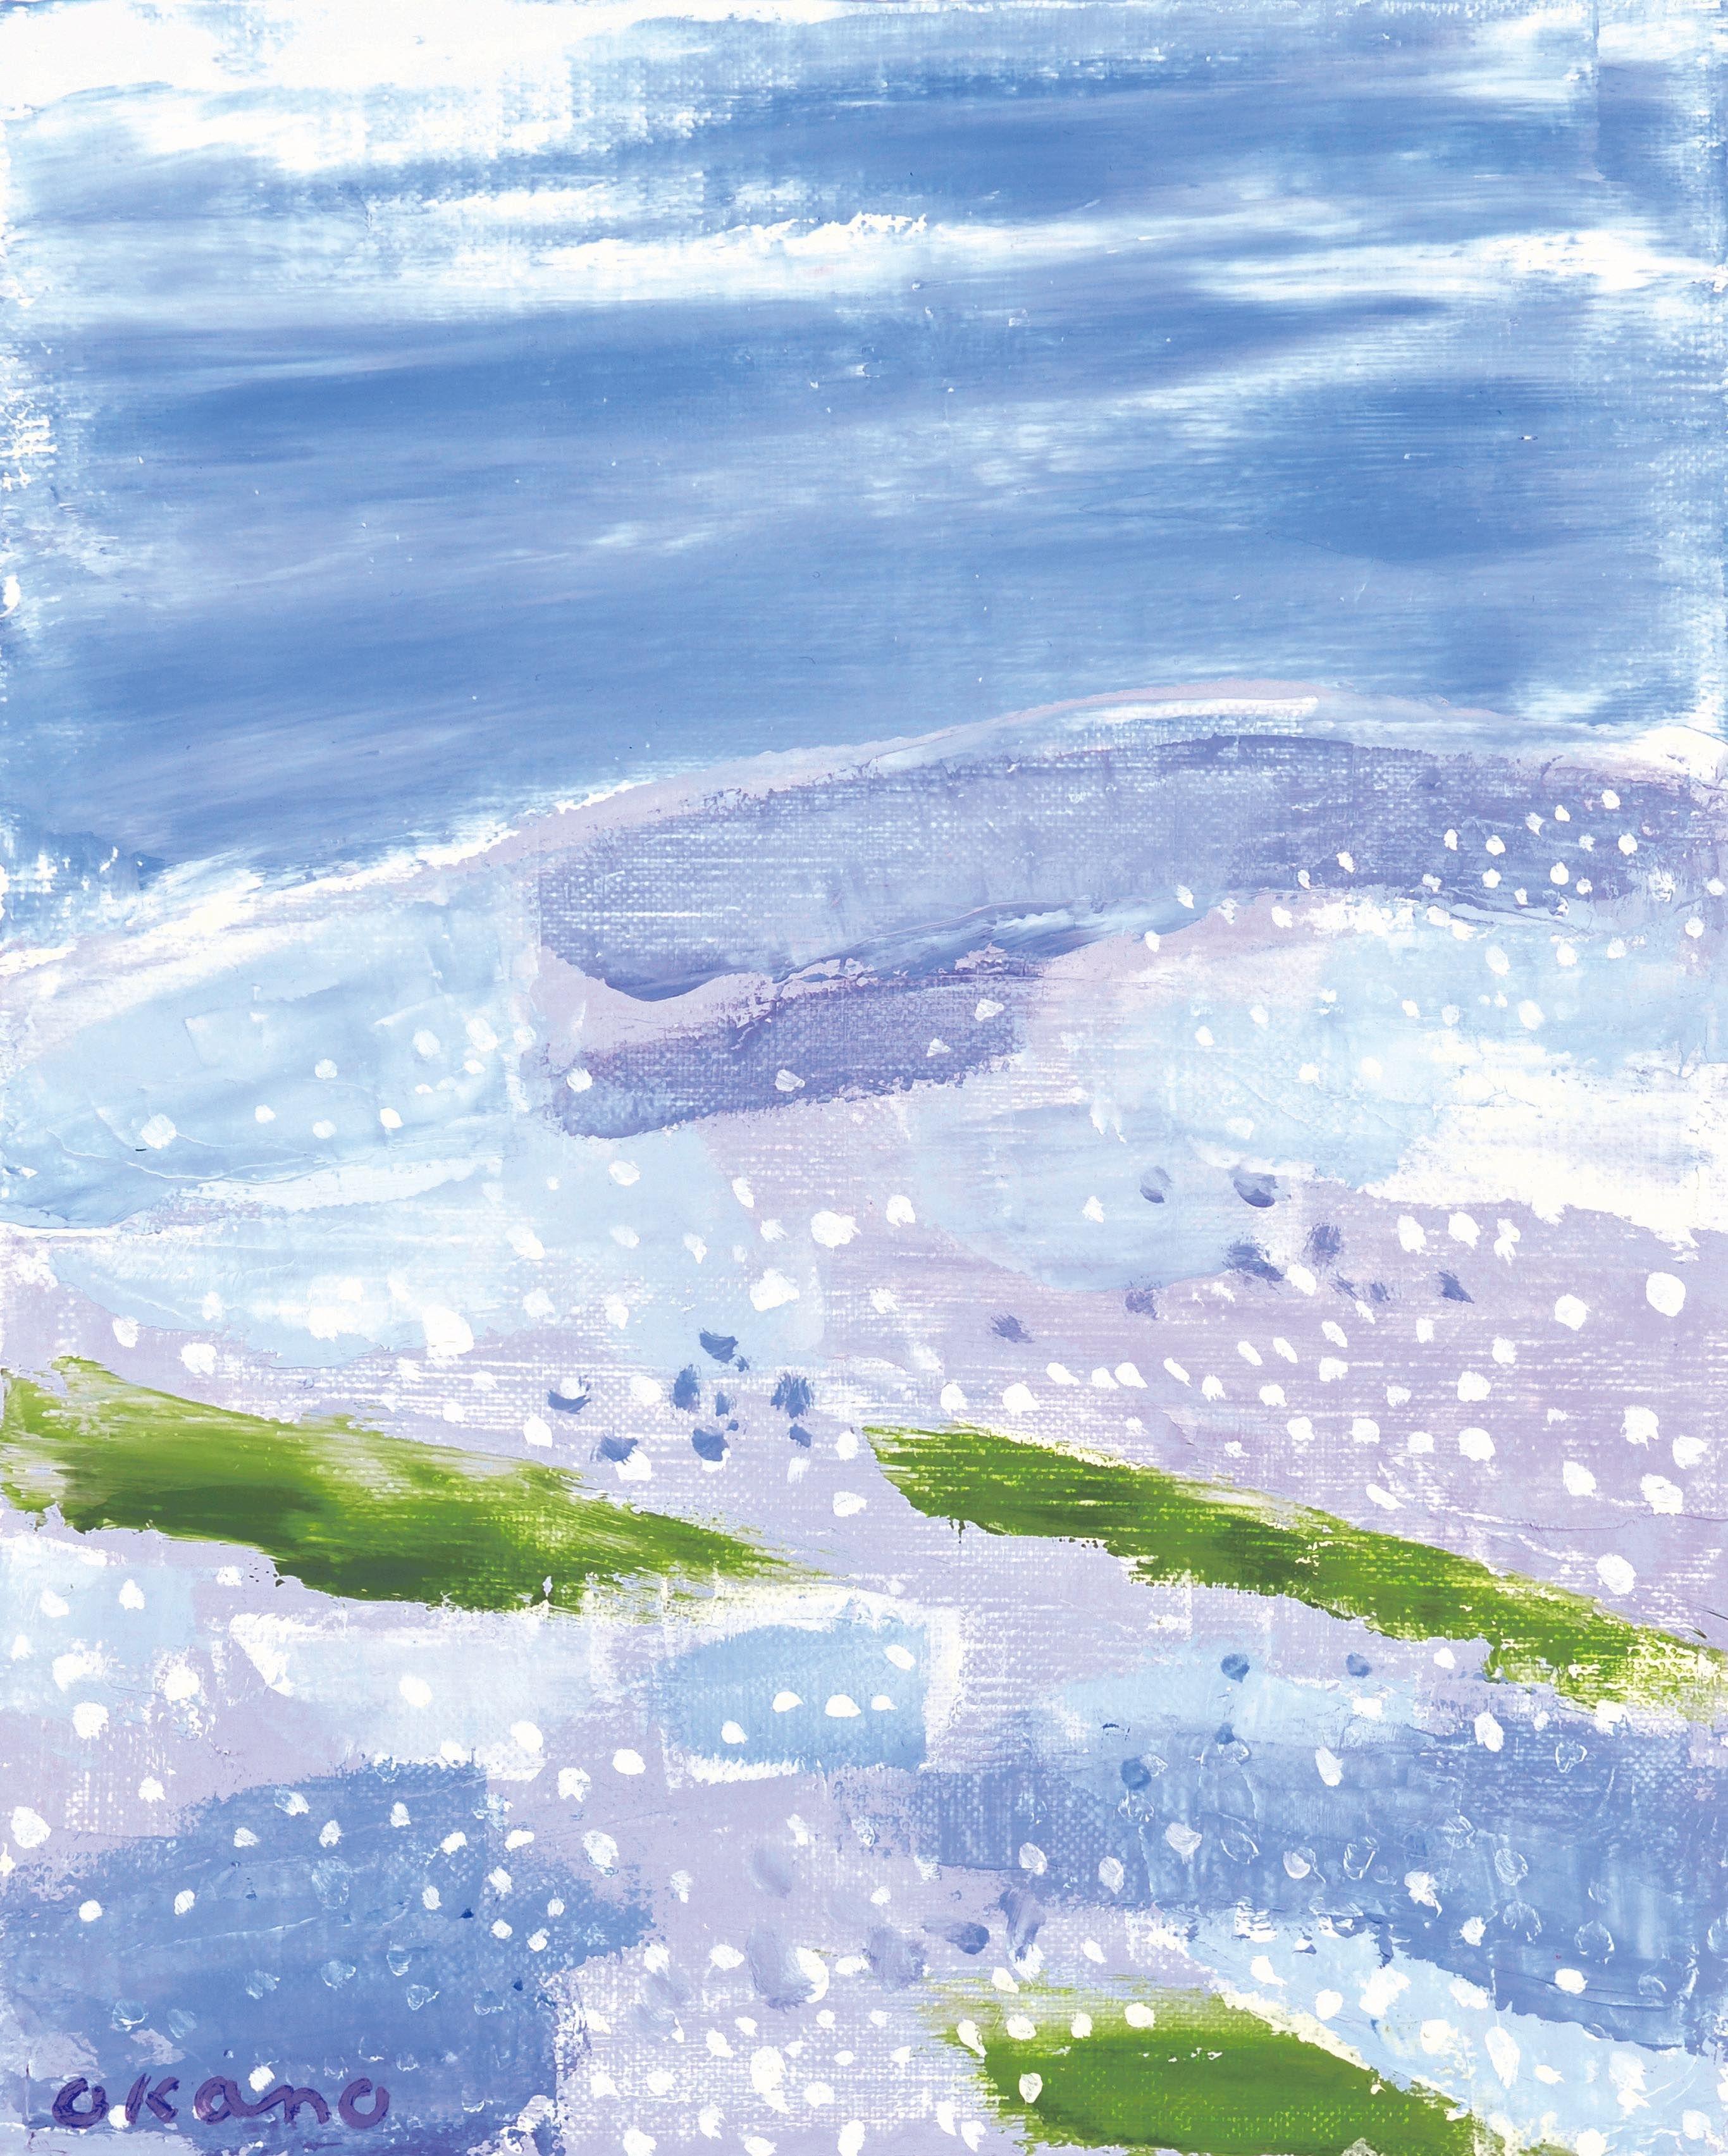 A scenary in lapis lazuli blue.